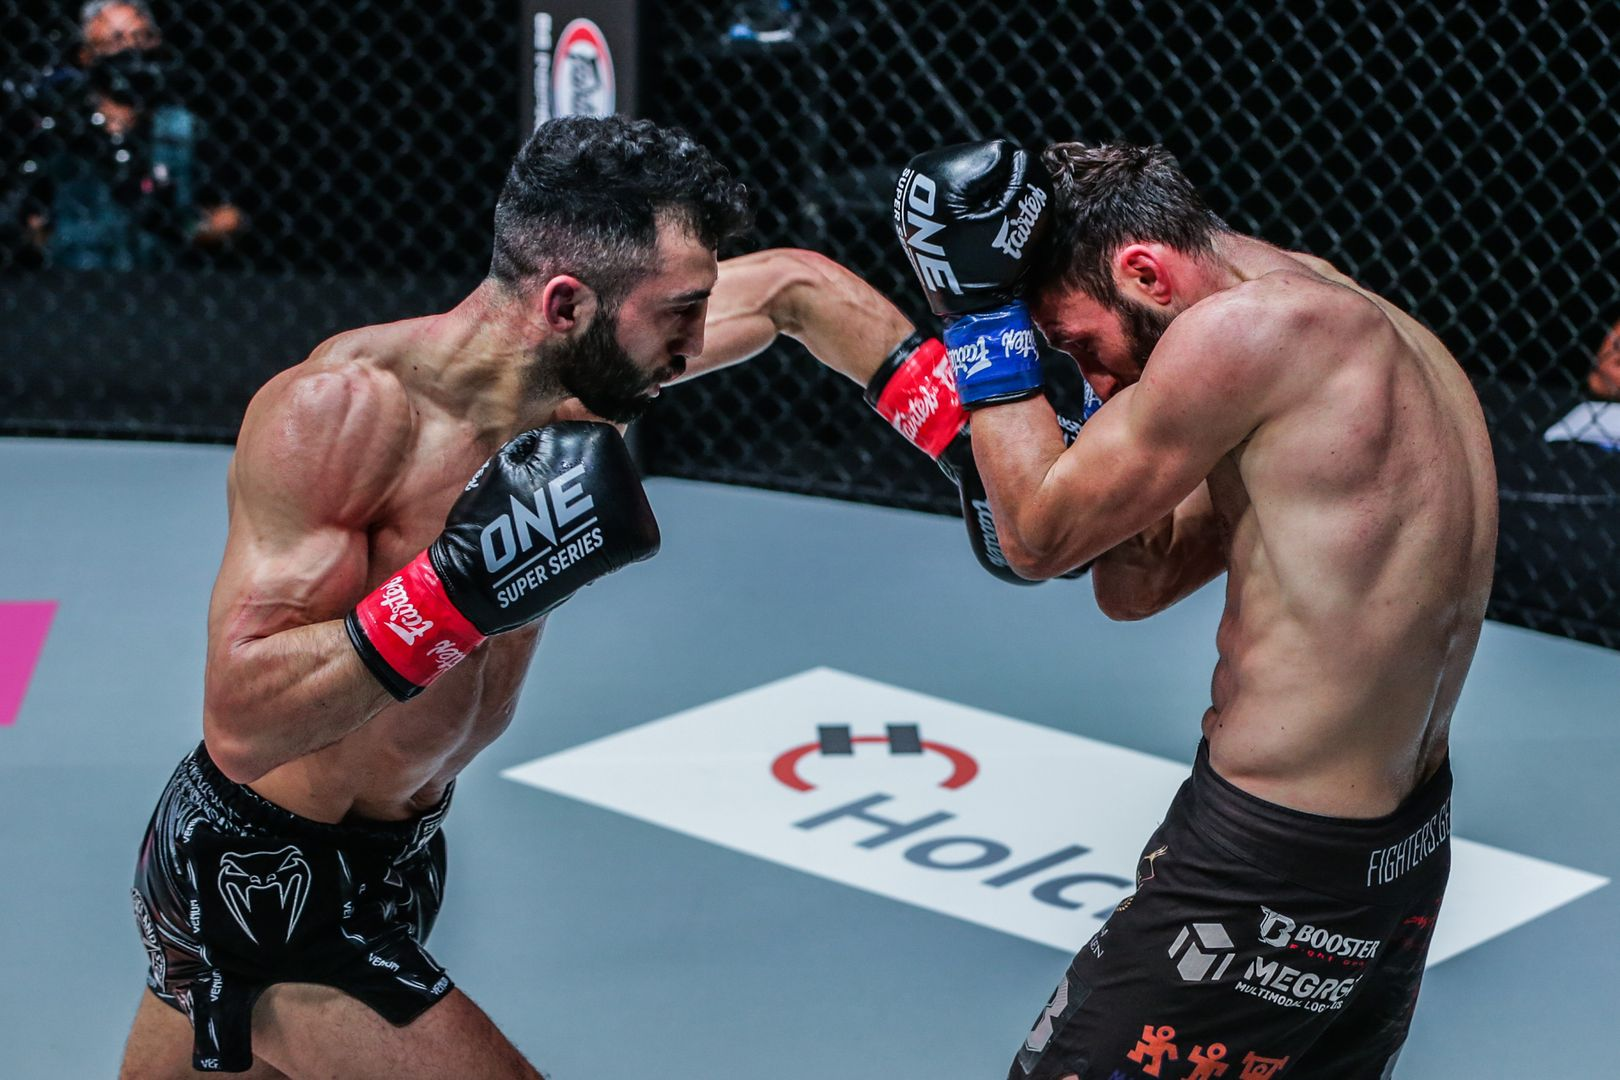 Giorgio Petrosyan fights Davit Kiria at ONE: FISTS OF FURY